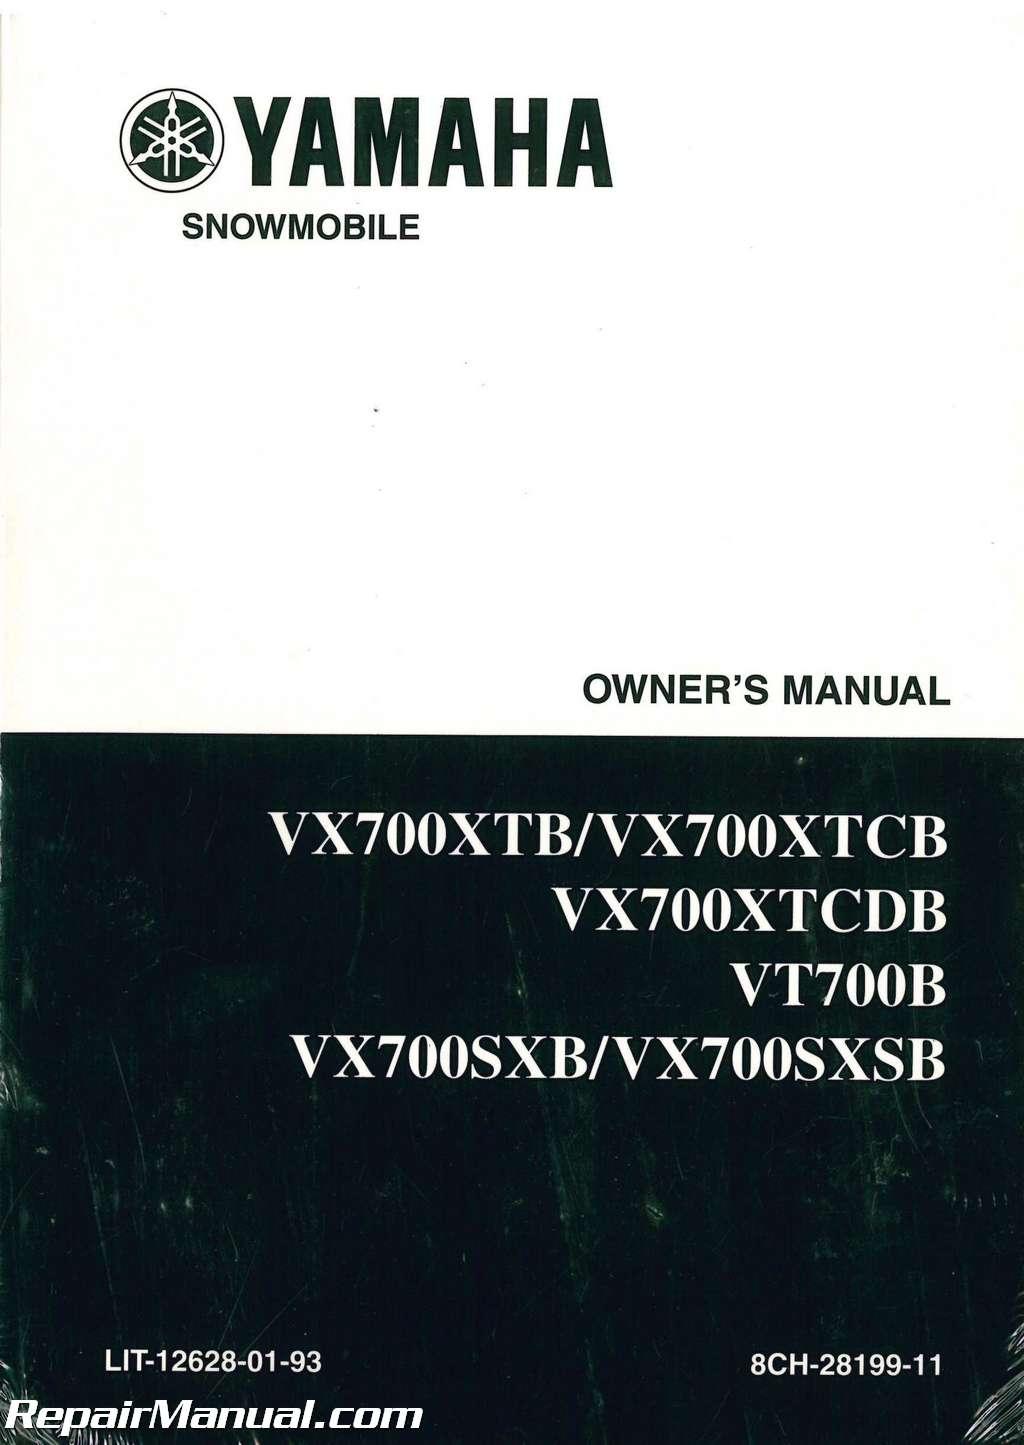 1997 yamaha vx700 vt700 snowmobile owners manual. Black Bedroom Furniture Sets. Home Design Ideas